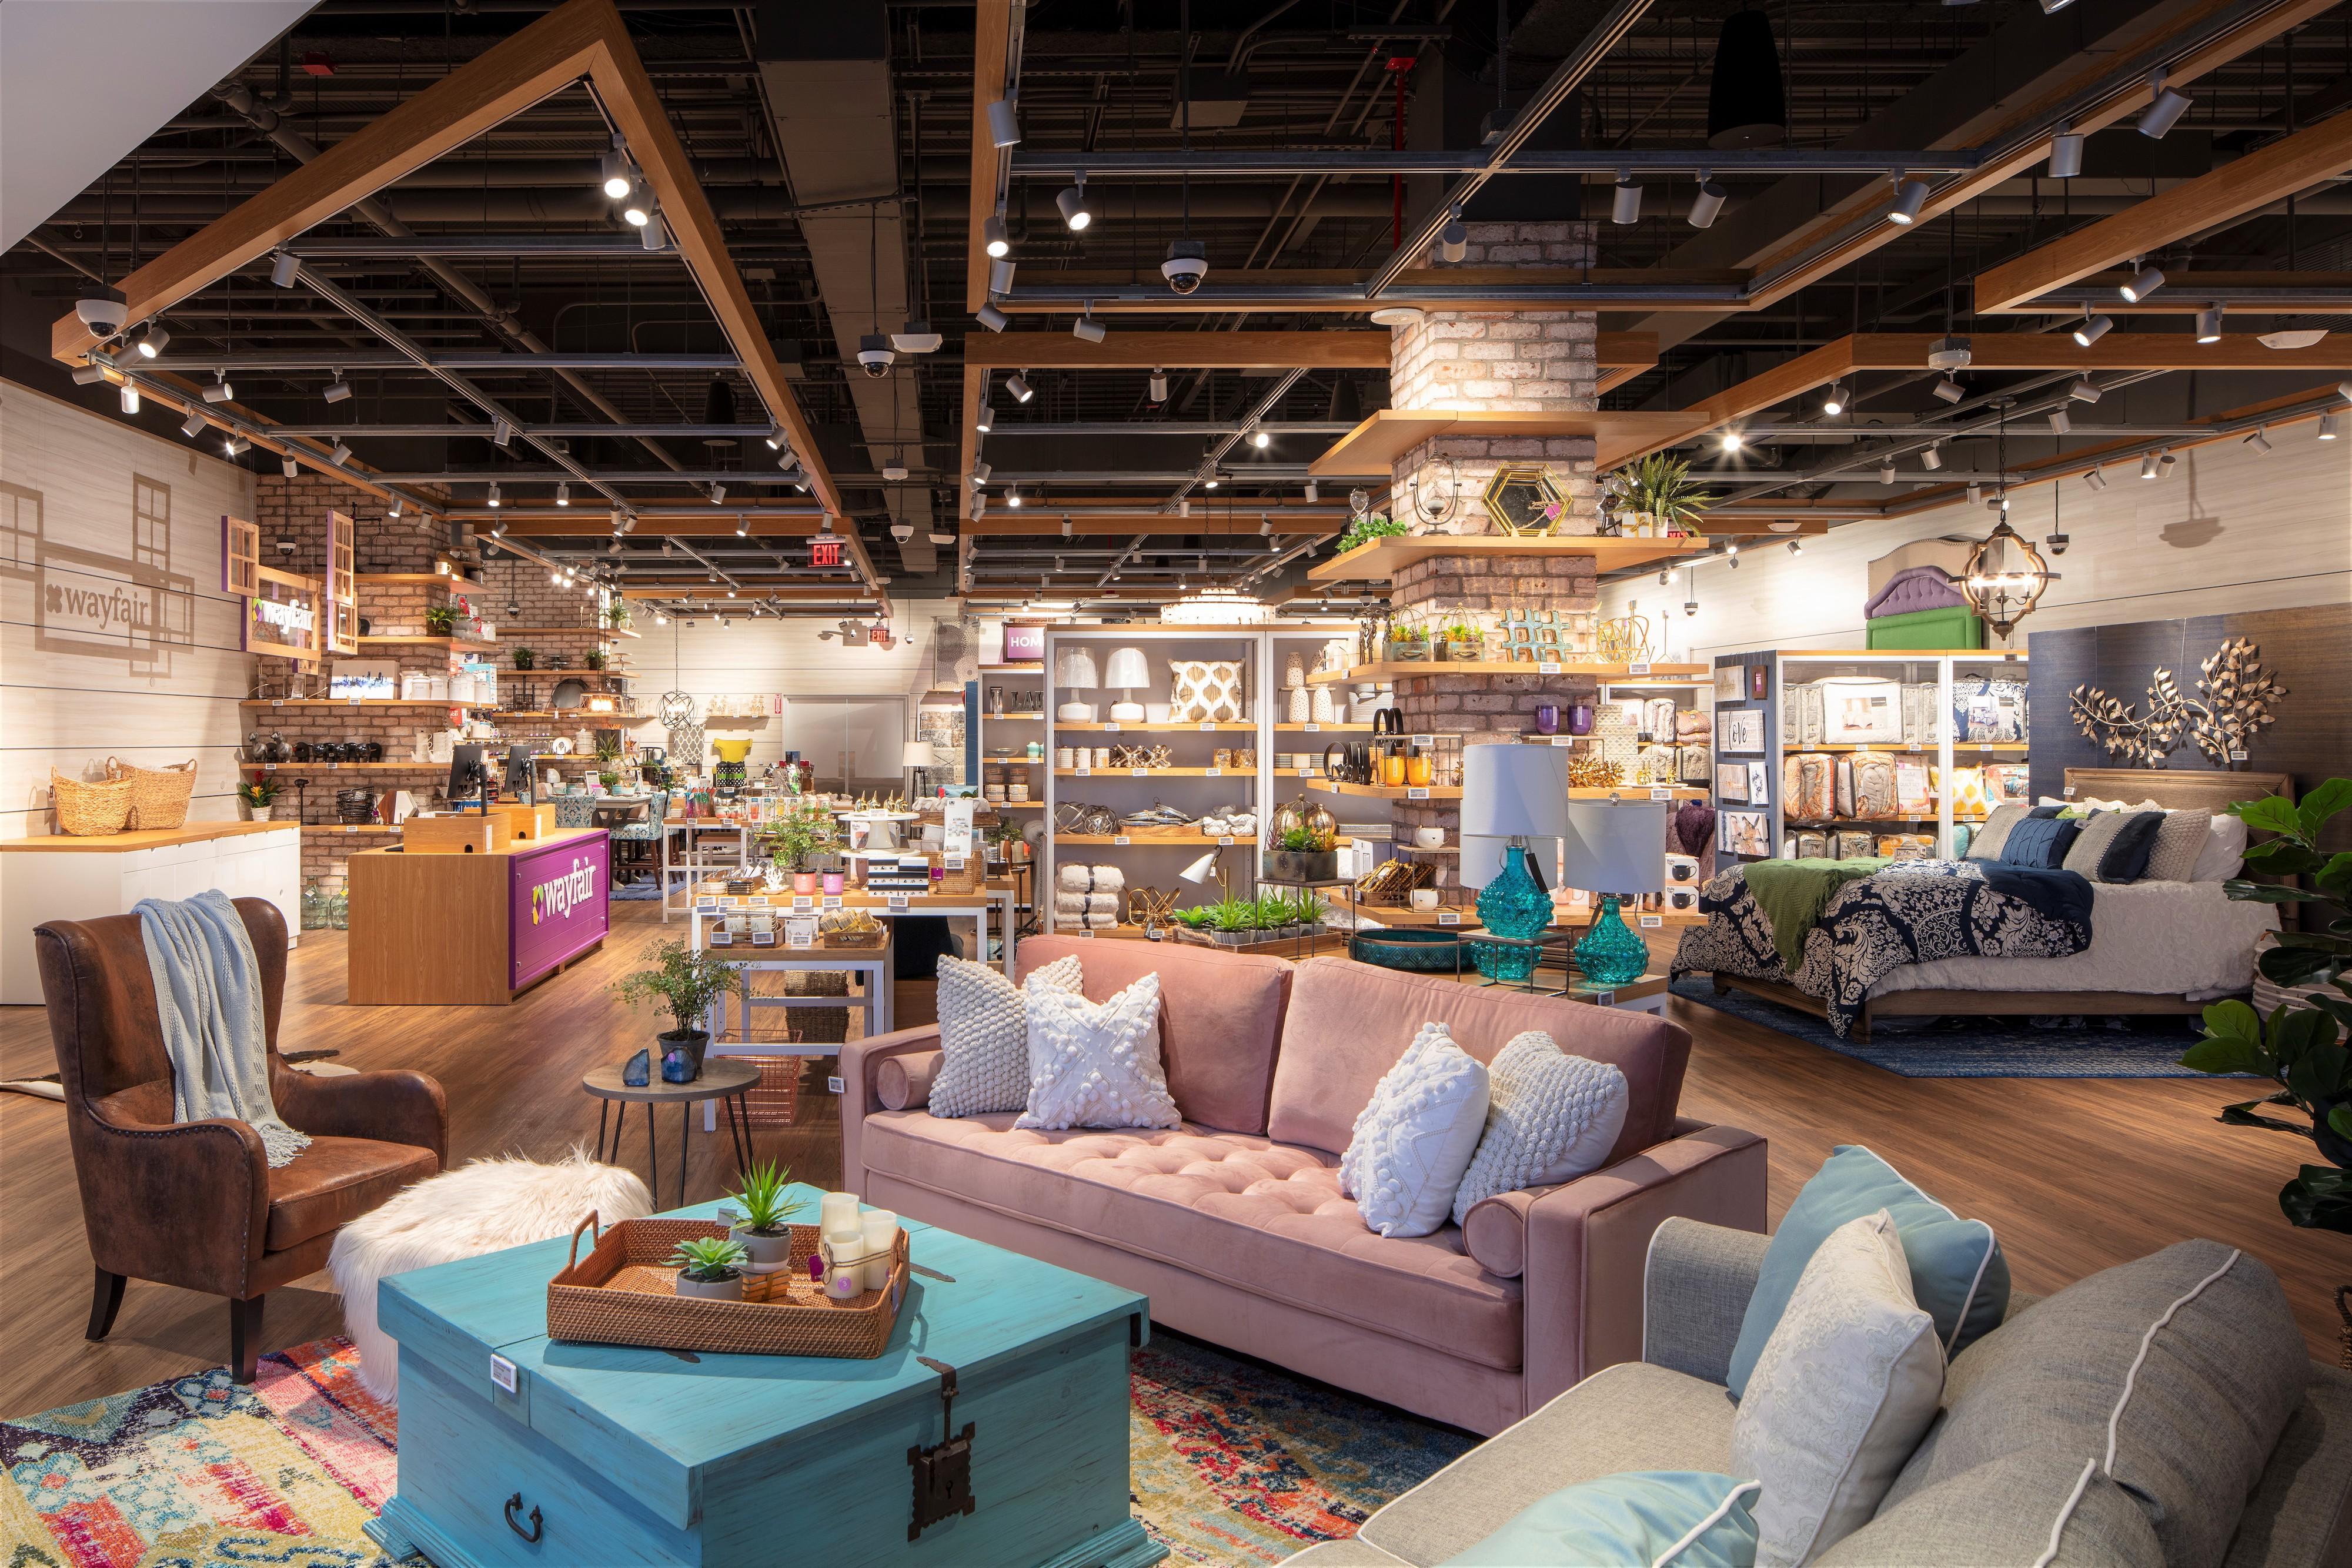 Peek inside Wayfair's first permanent brick-and-mortar store